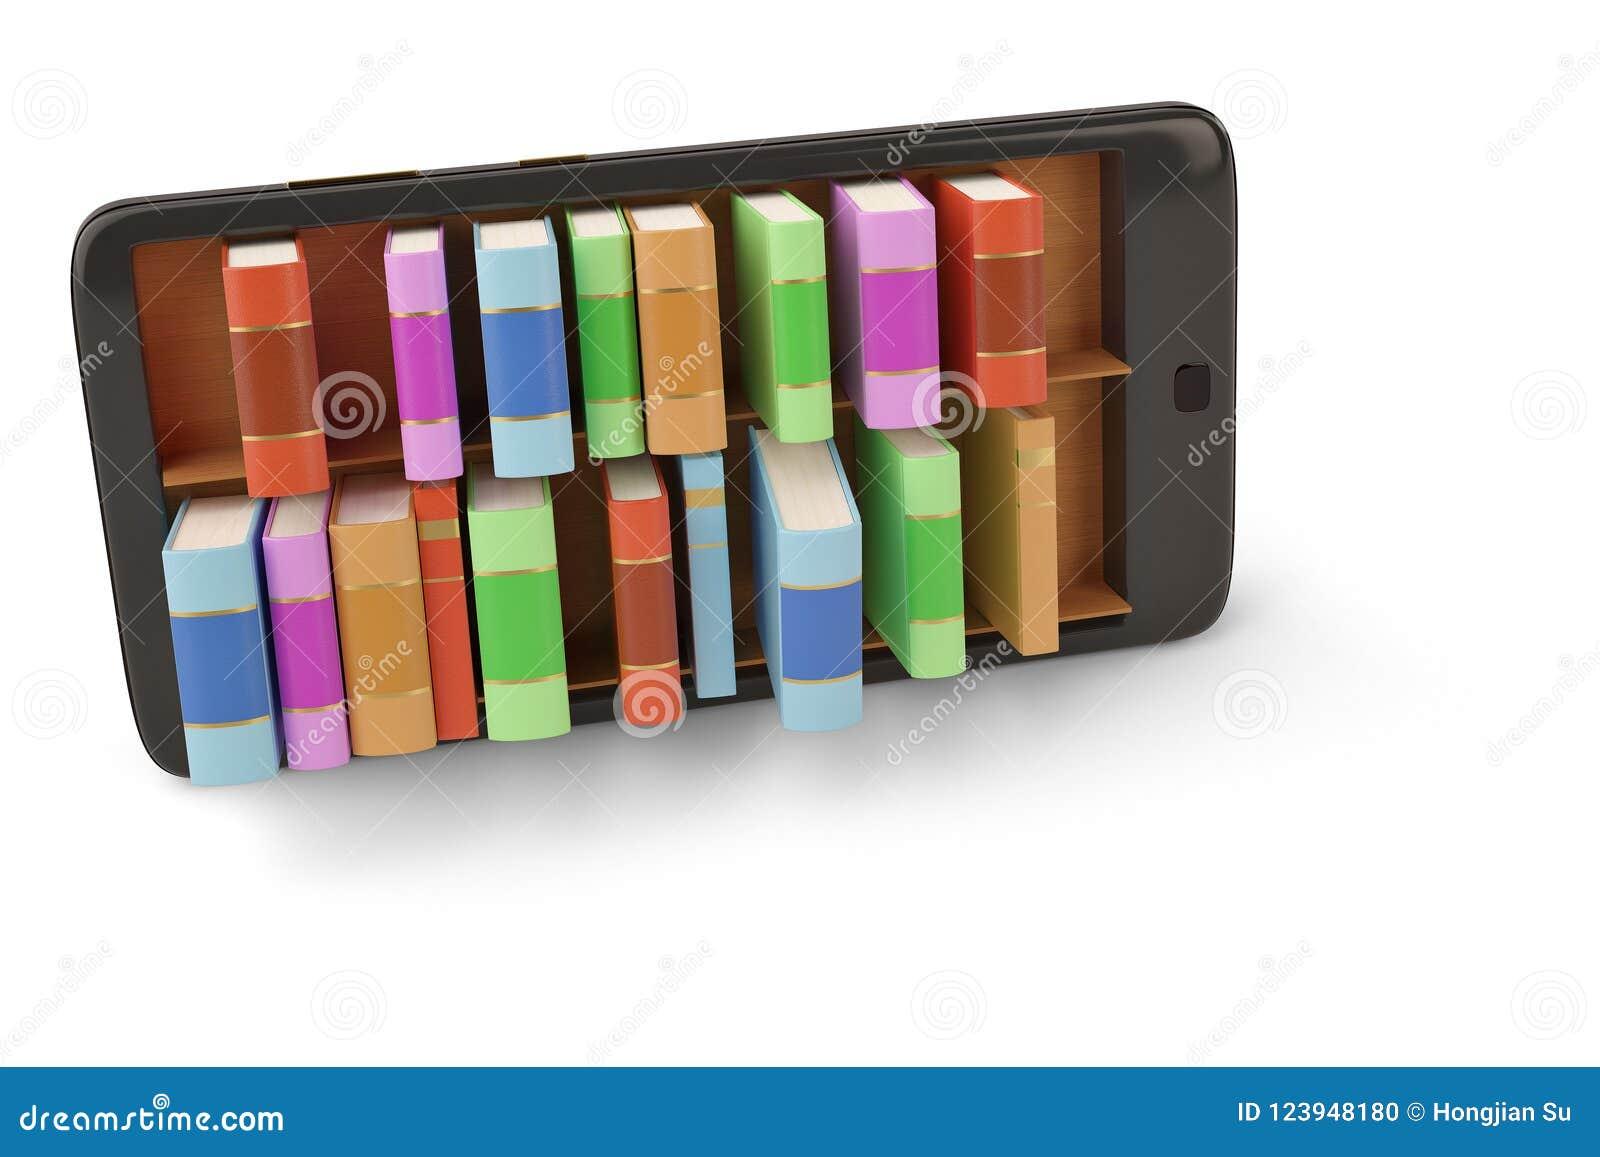 Mobile Phone With Bookshelf E Book Library Concept 3d Illustrati